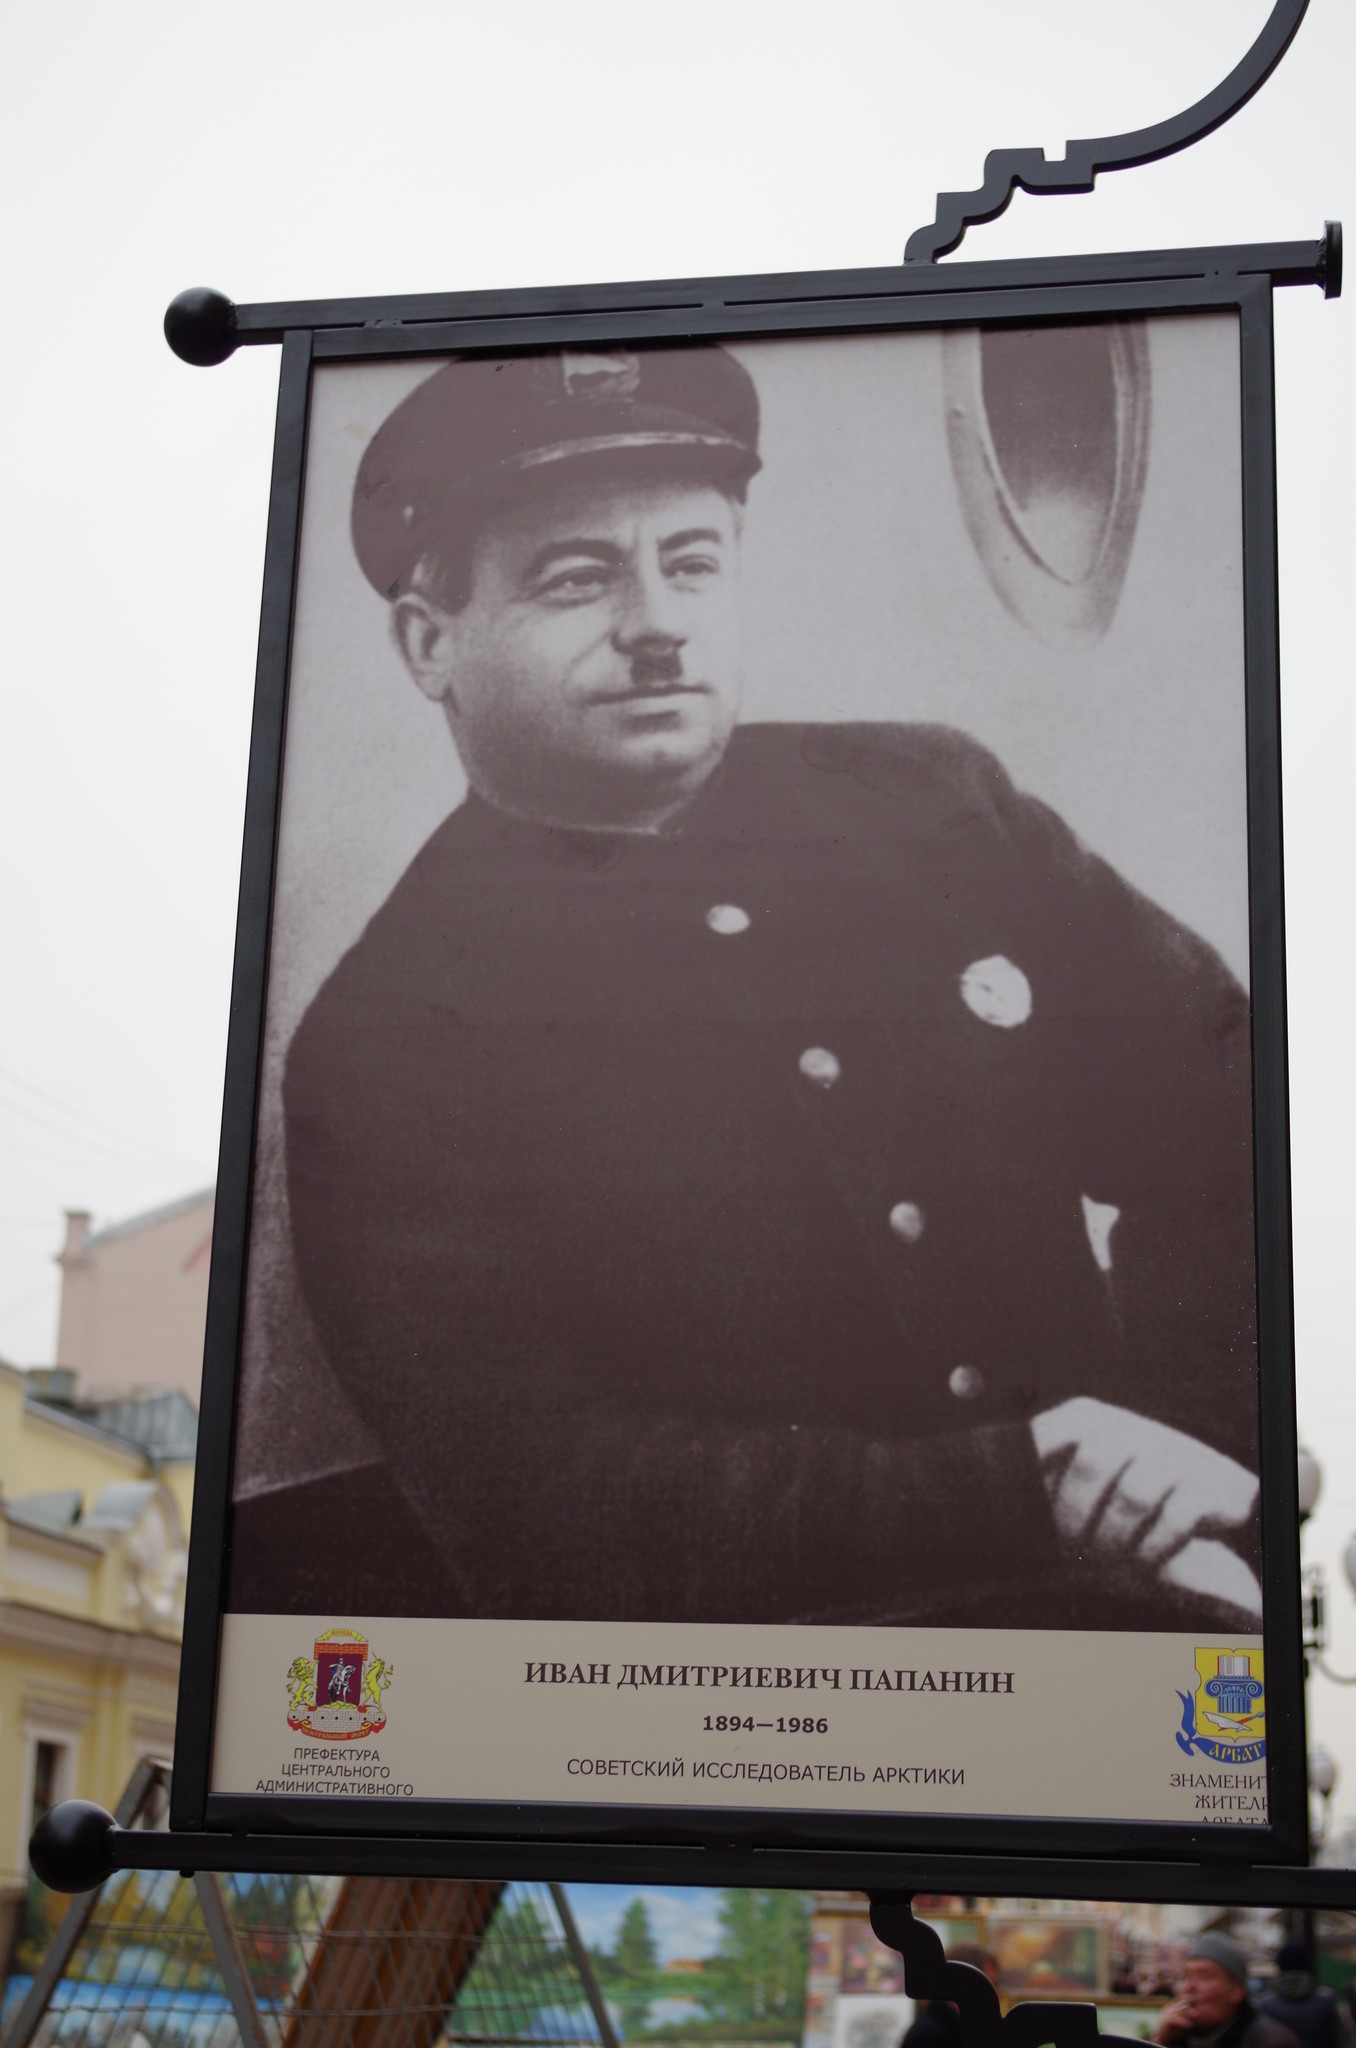 Портрет Ивана Дмитриевича Папанина на Арбате